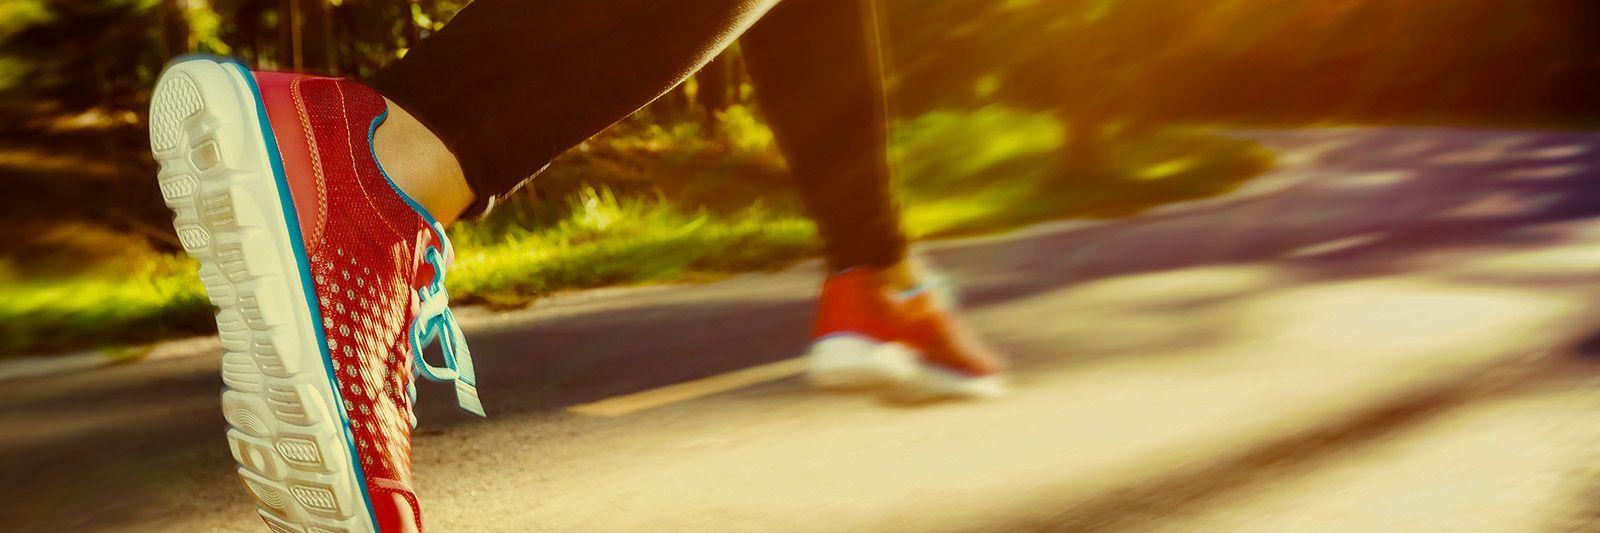 What is a Sad Runner? - Fighting Depression - SadRunner.com